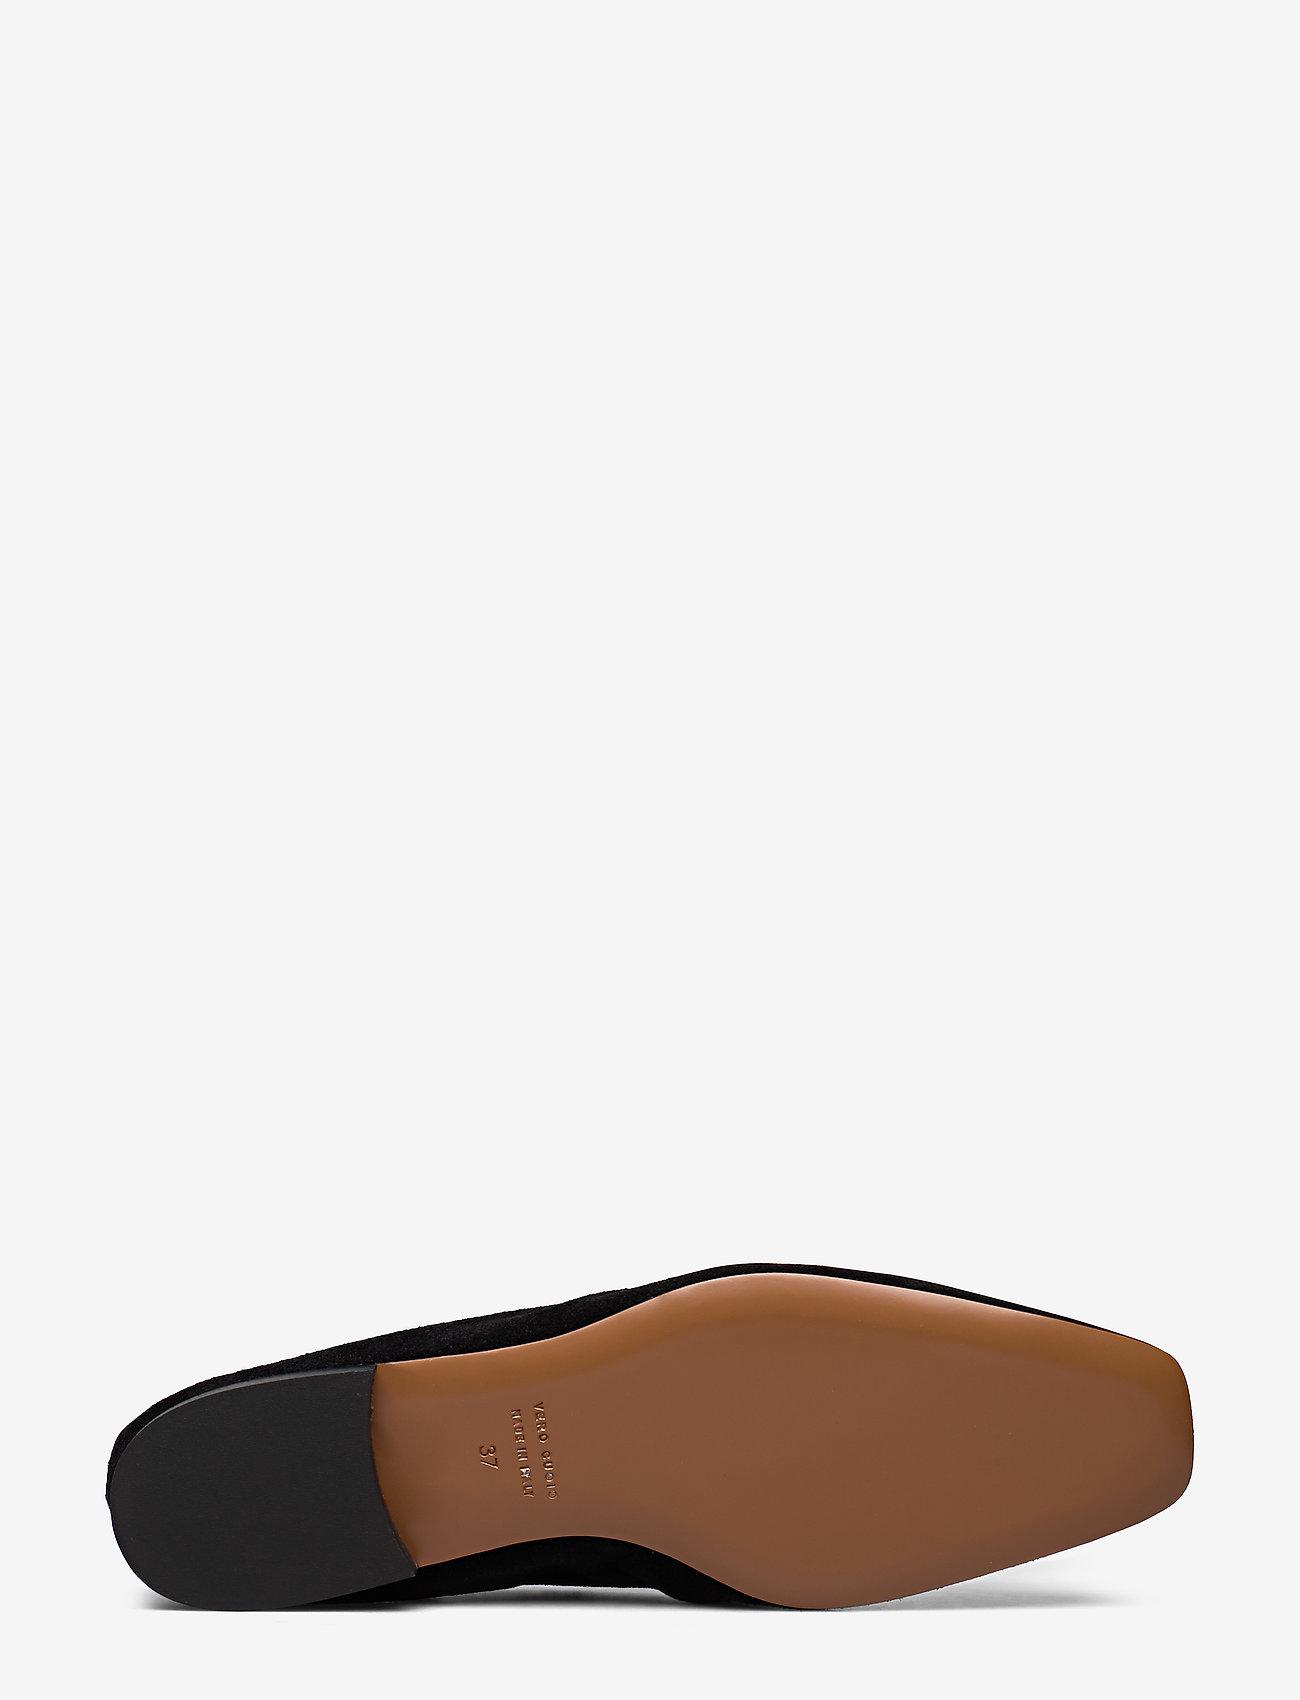 ATP Atelier - Andrano Black Suede - shoes - black - 4